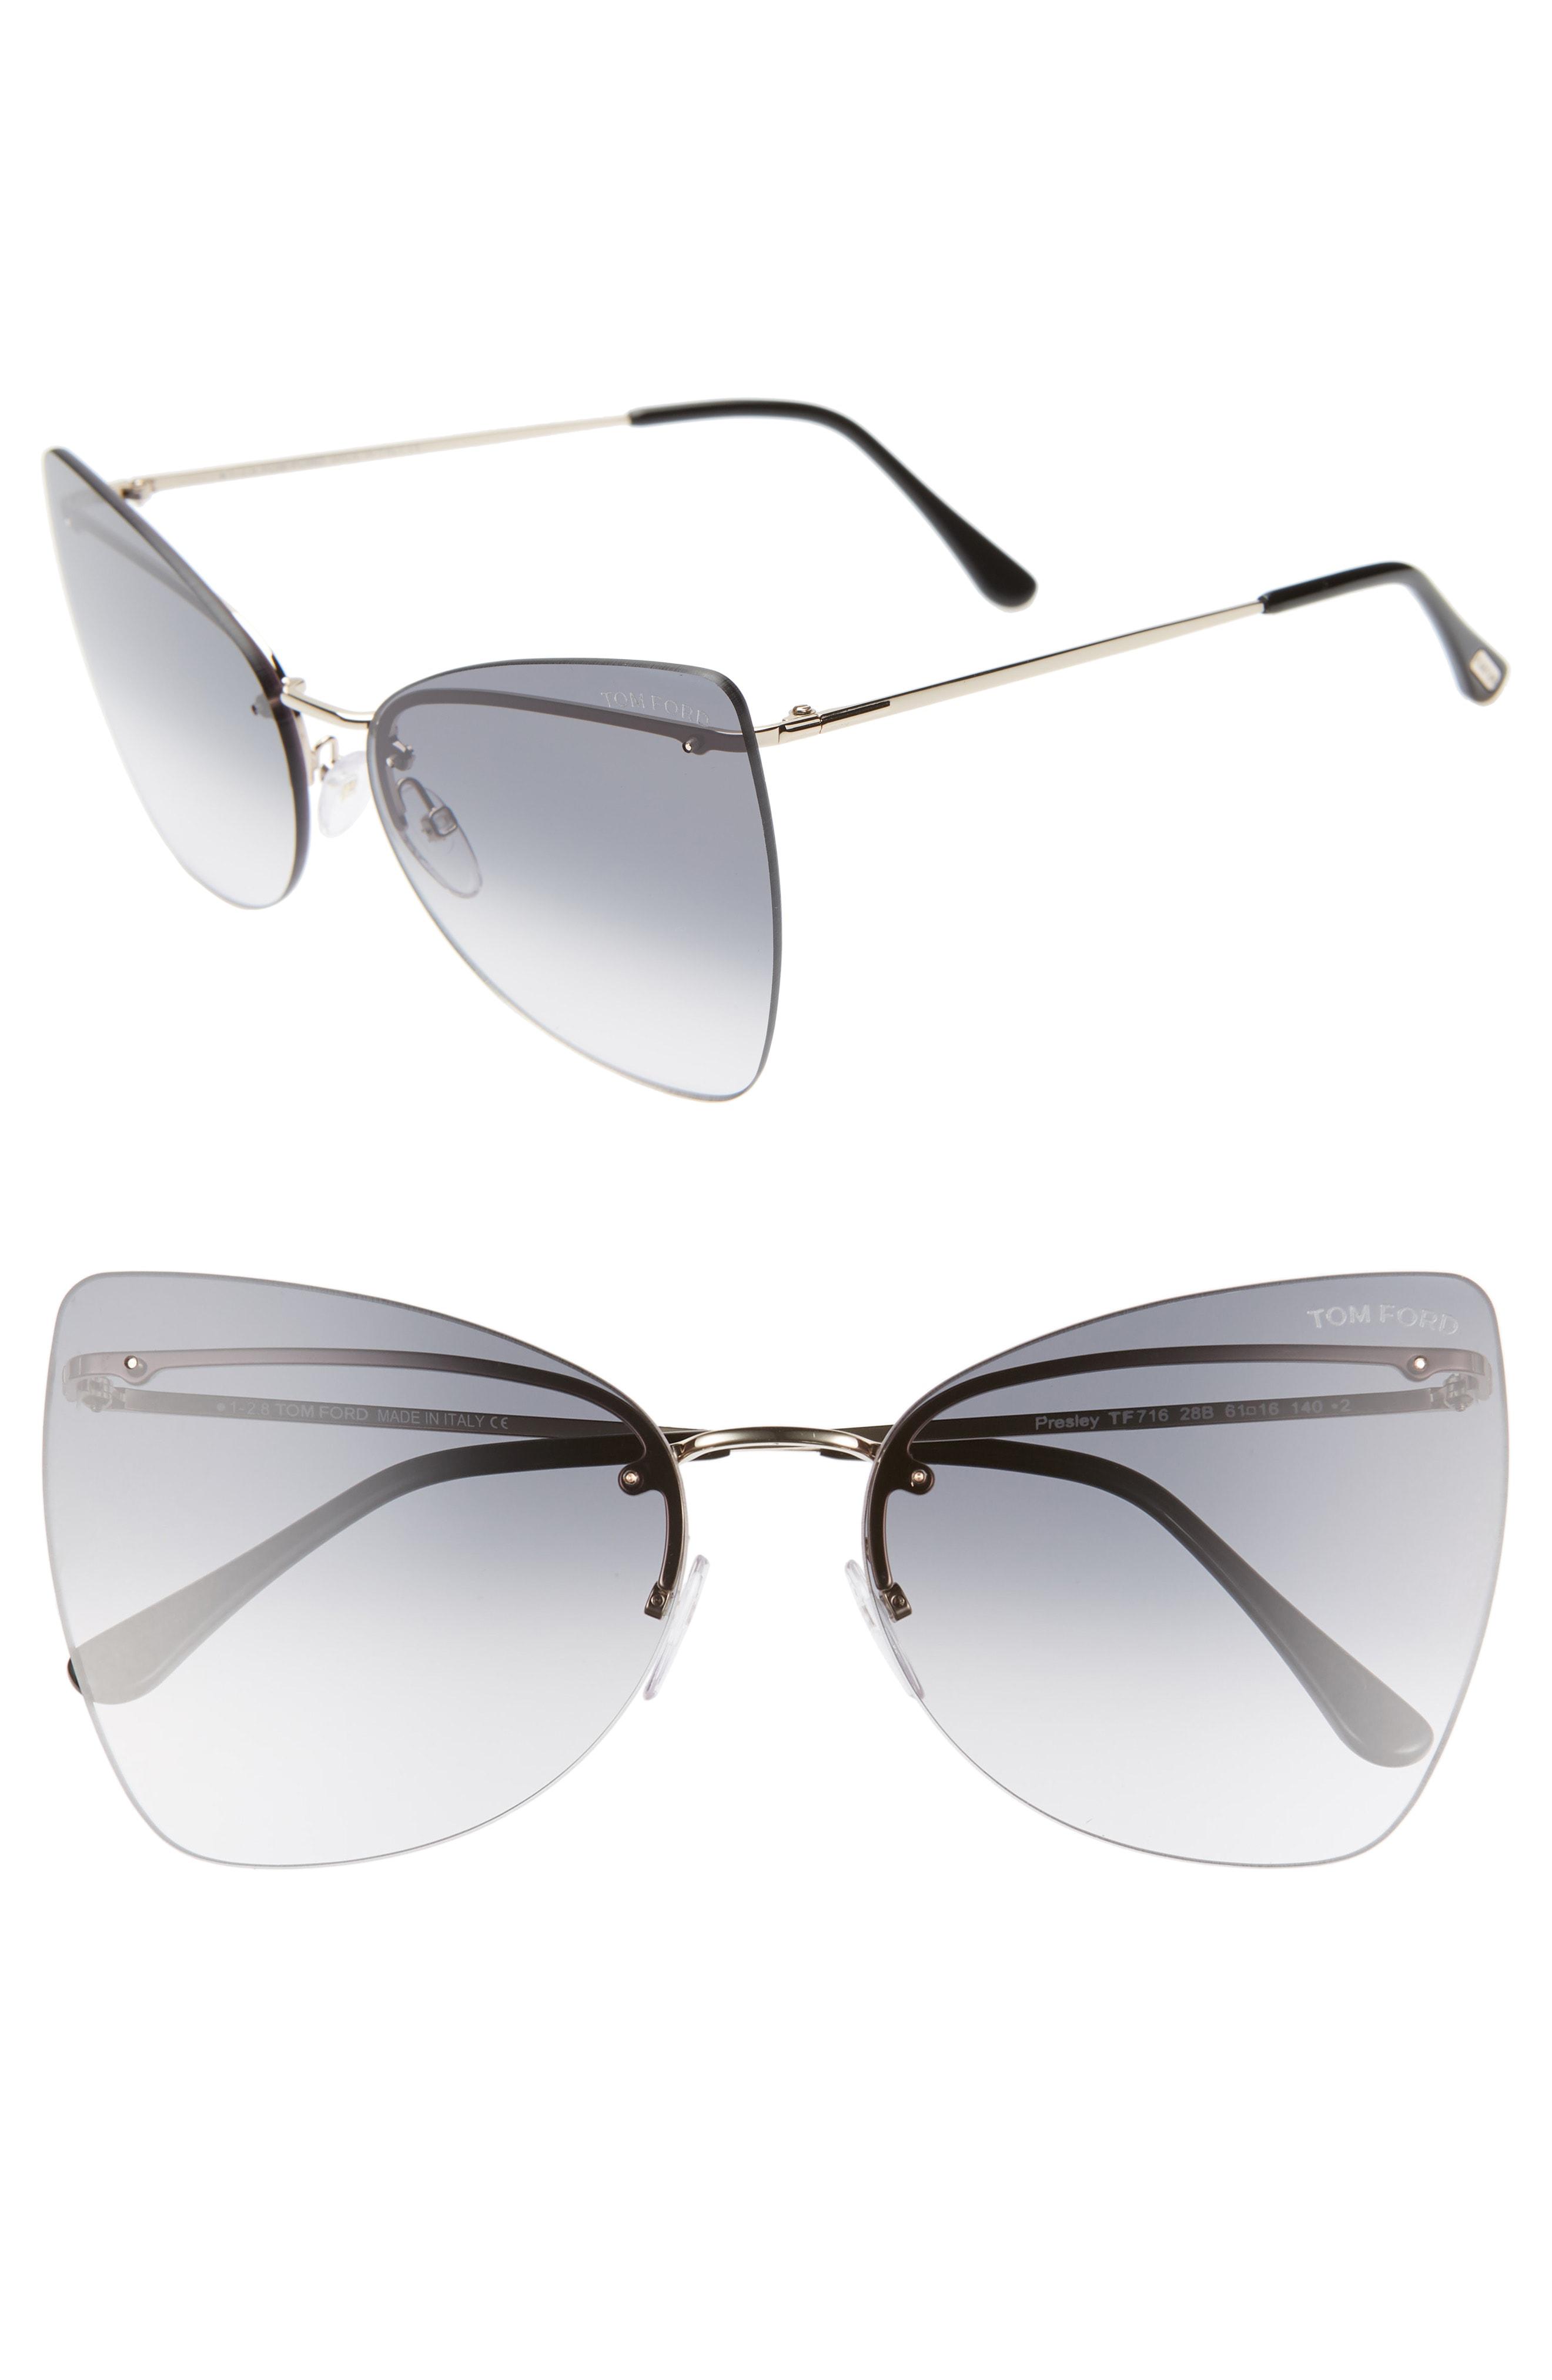 039f050ba6f8 Tom Ford Presley 61Mm Butterfly Sunglasses - Rose Gold  Black  Smoke ...